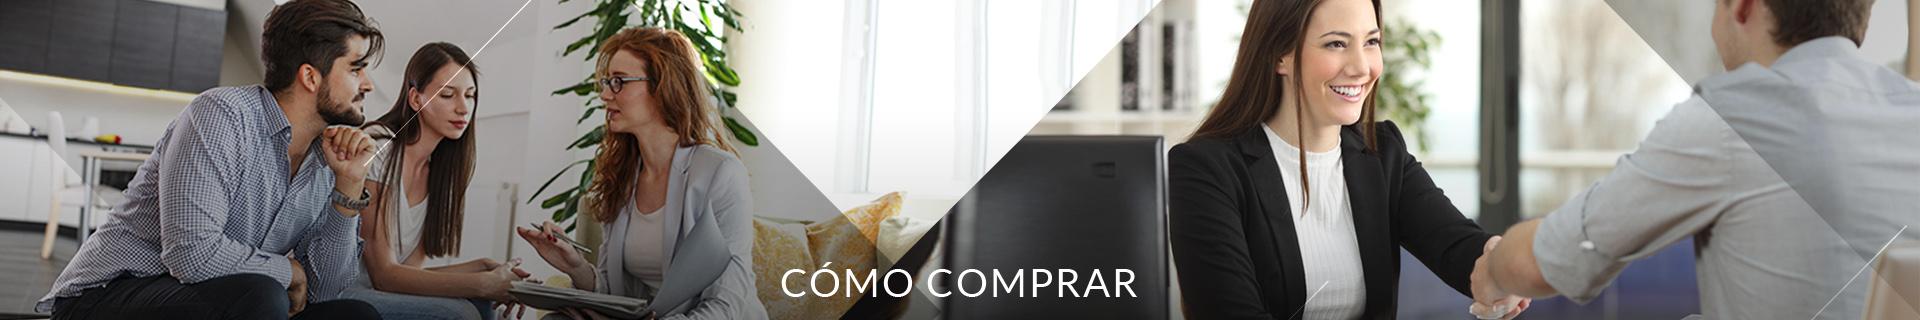 sliders_comoComprar